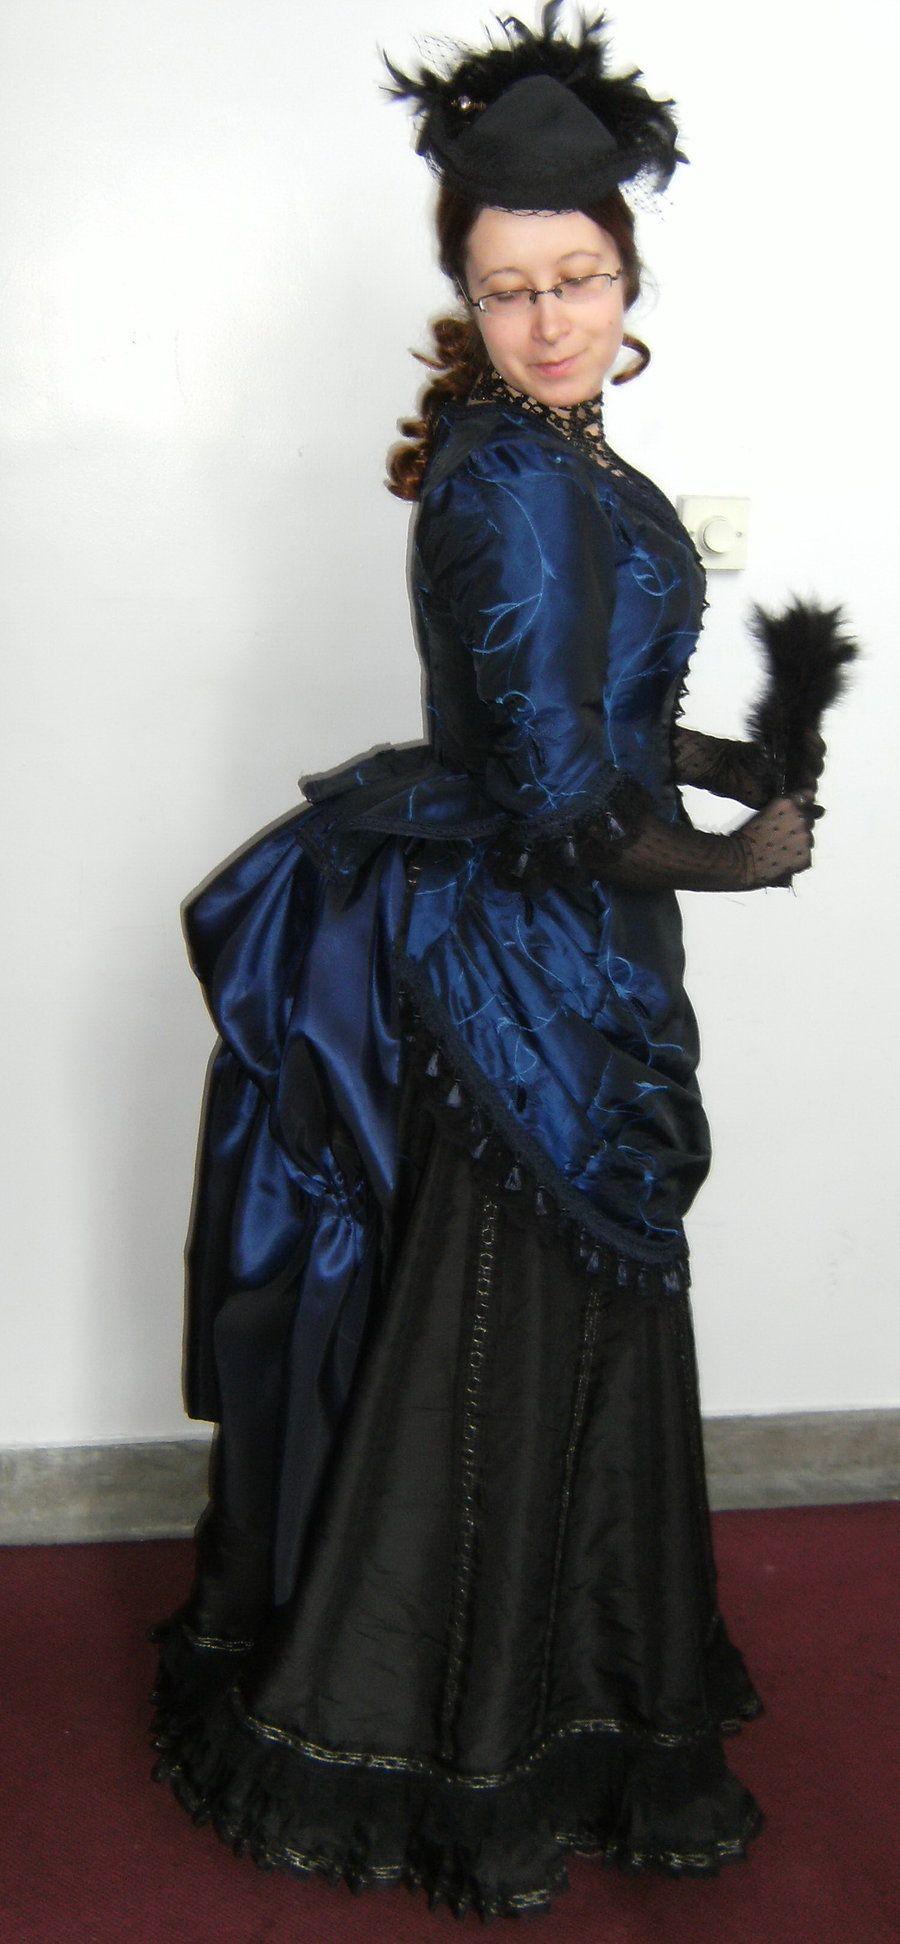 Victorian Bustle Dress Side By Numberjumble Deviantart On